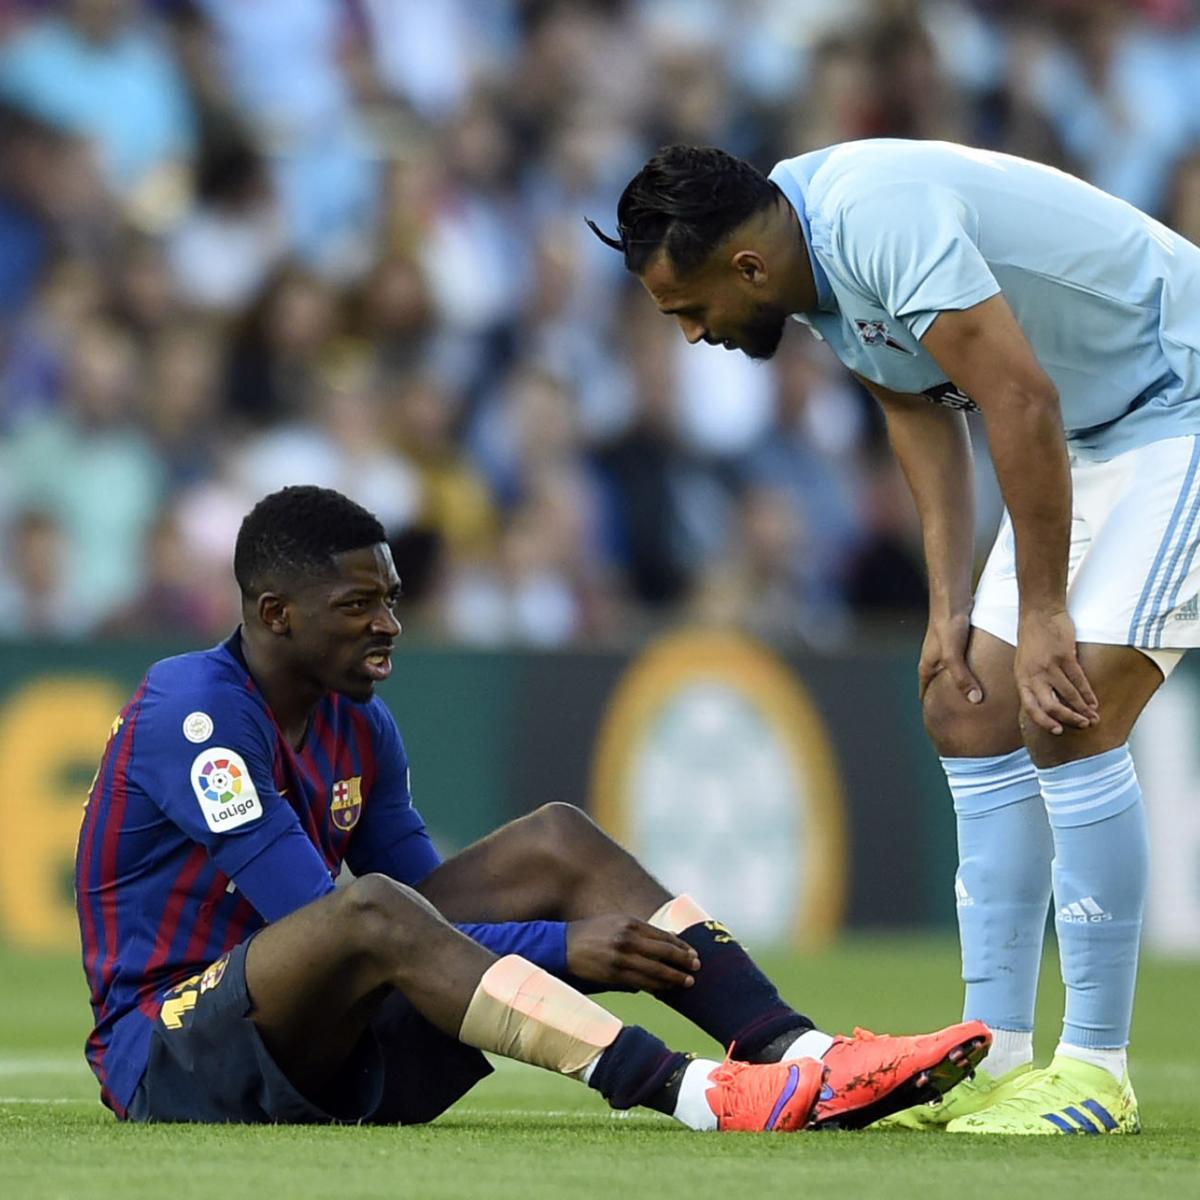 Celta Vigo Vs Barca Totalsportek: Barcelona Fall To Celta Vigo In La Liga After Ousmane